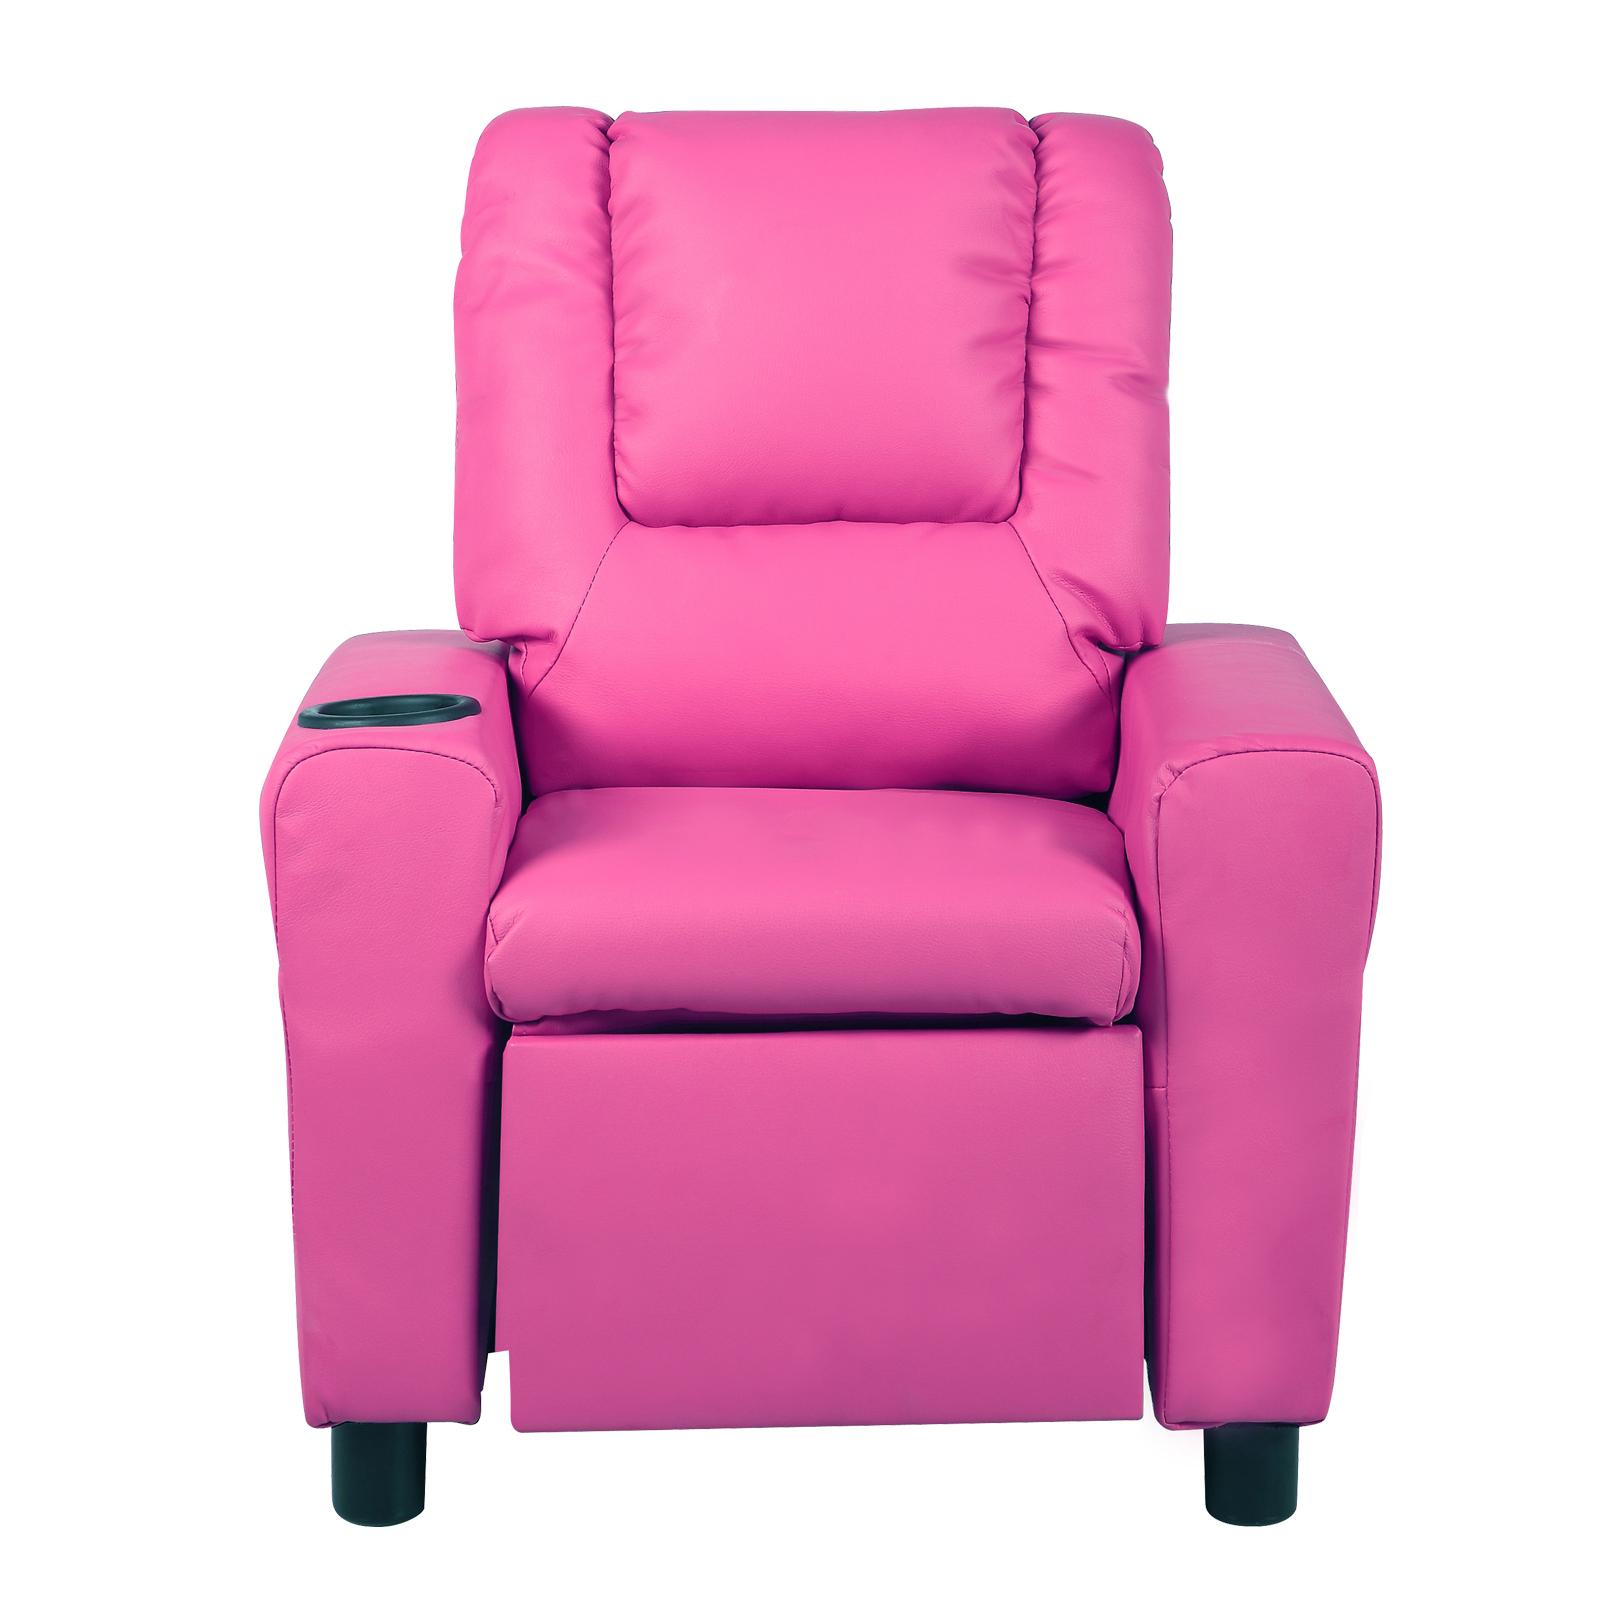 Kids Recliner Armchair Children 39 S Furniture Sofa Seat